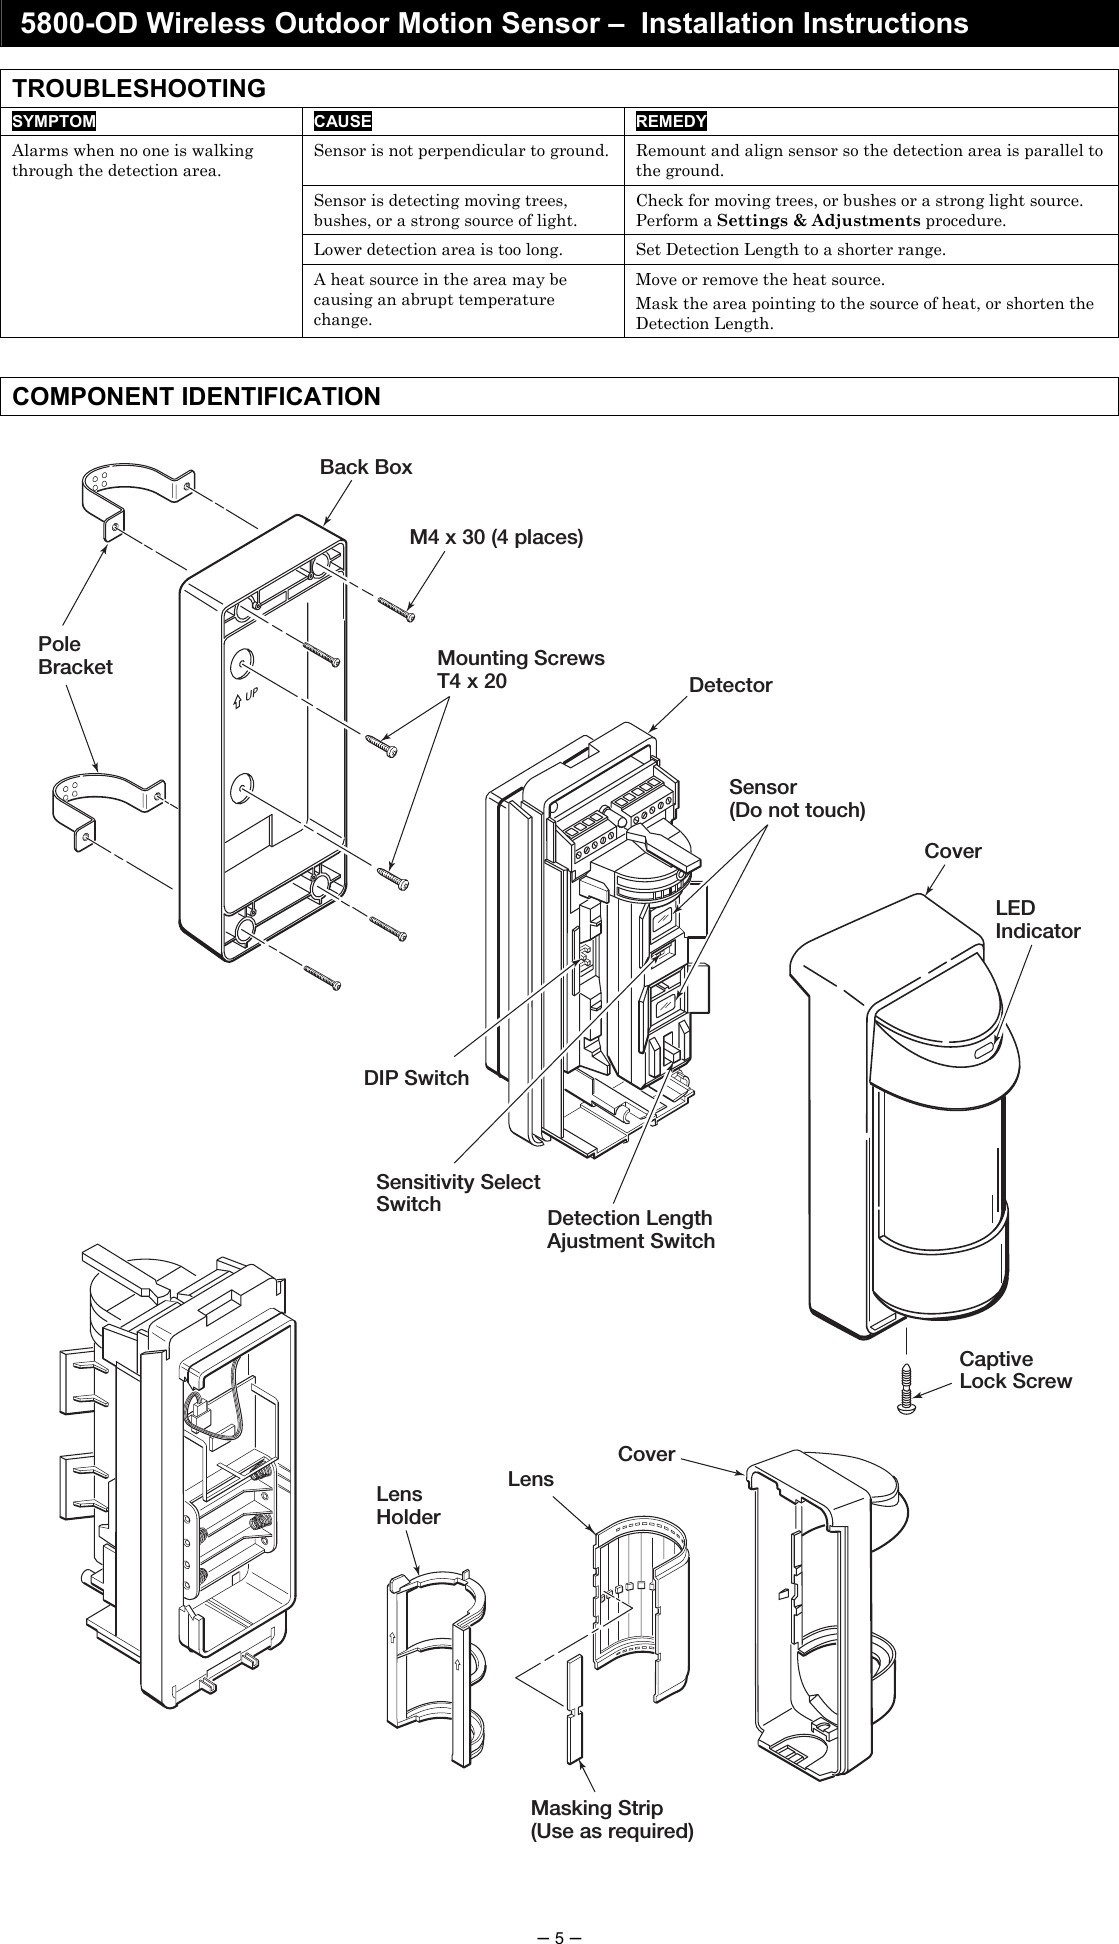 hight resolution of lp jr wiring diagram free wiring diagramlp jr wiring diagram gibson les paul deluxe wiring diagram